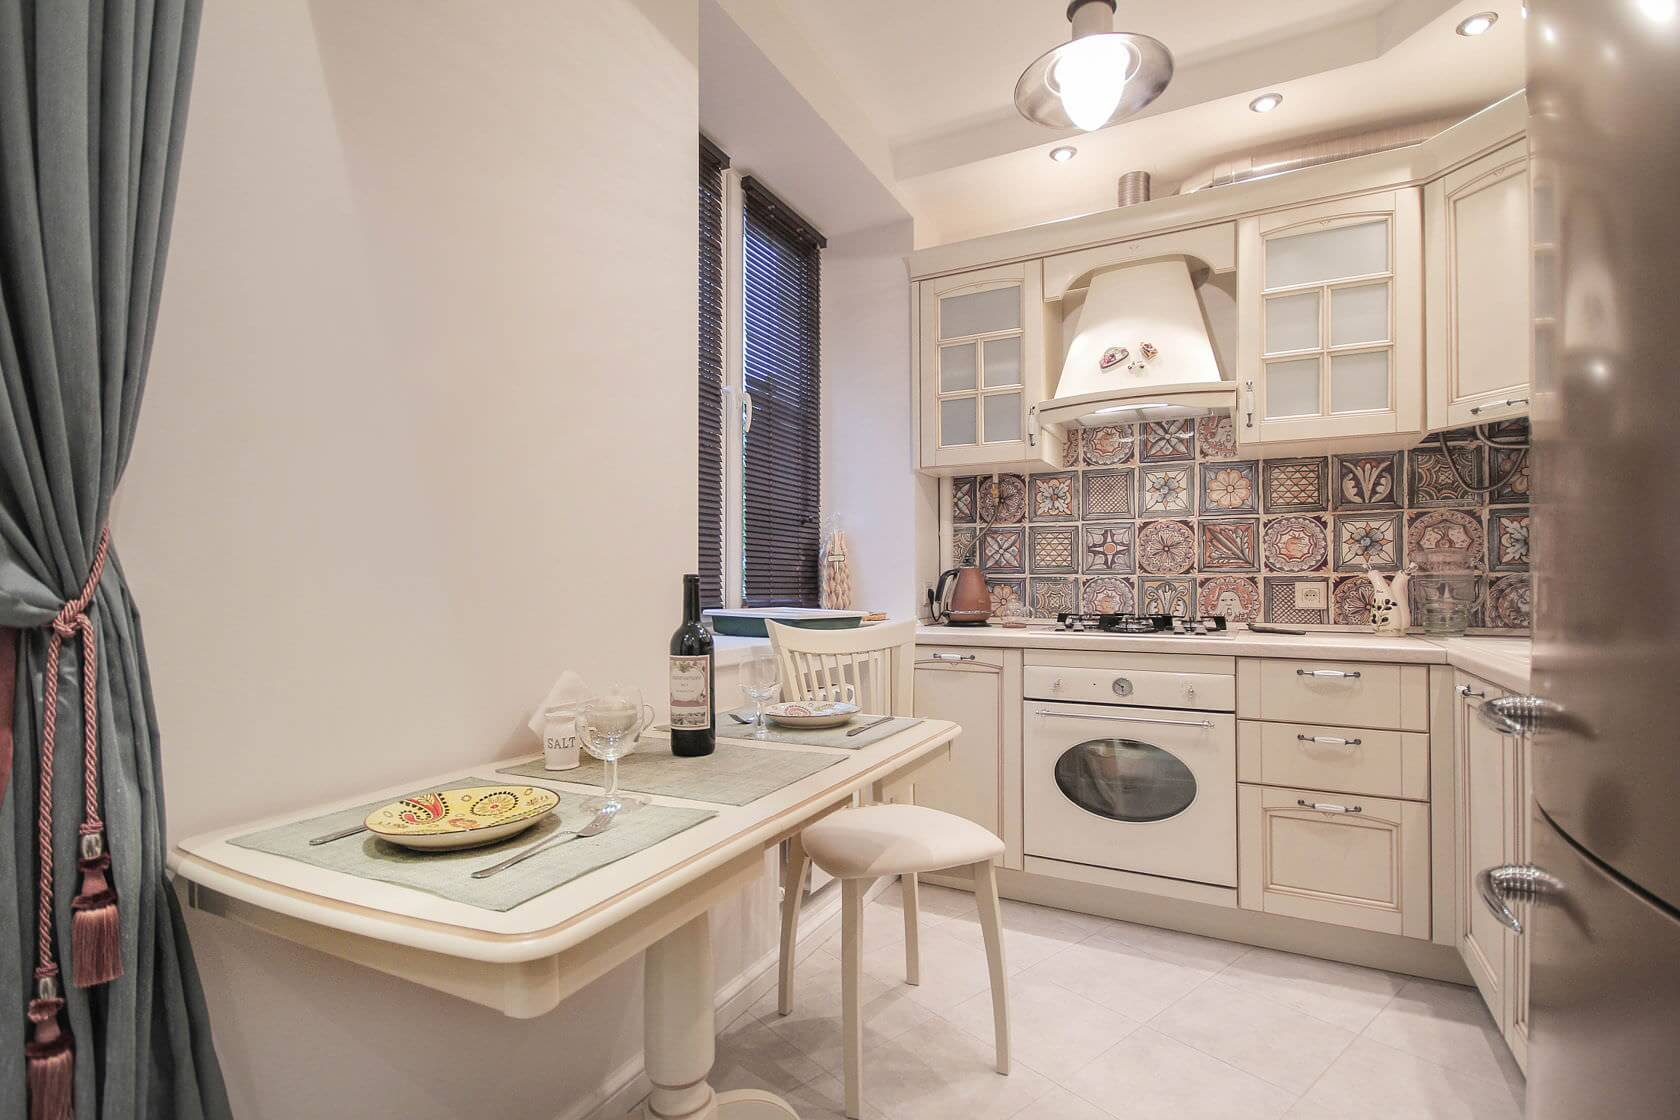 Кухня 6 кв м в стиле неоклассики